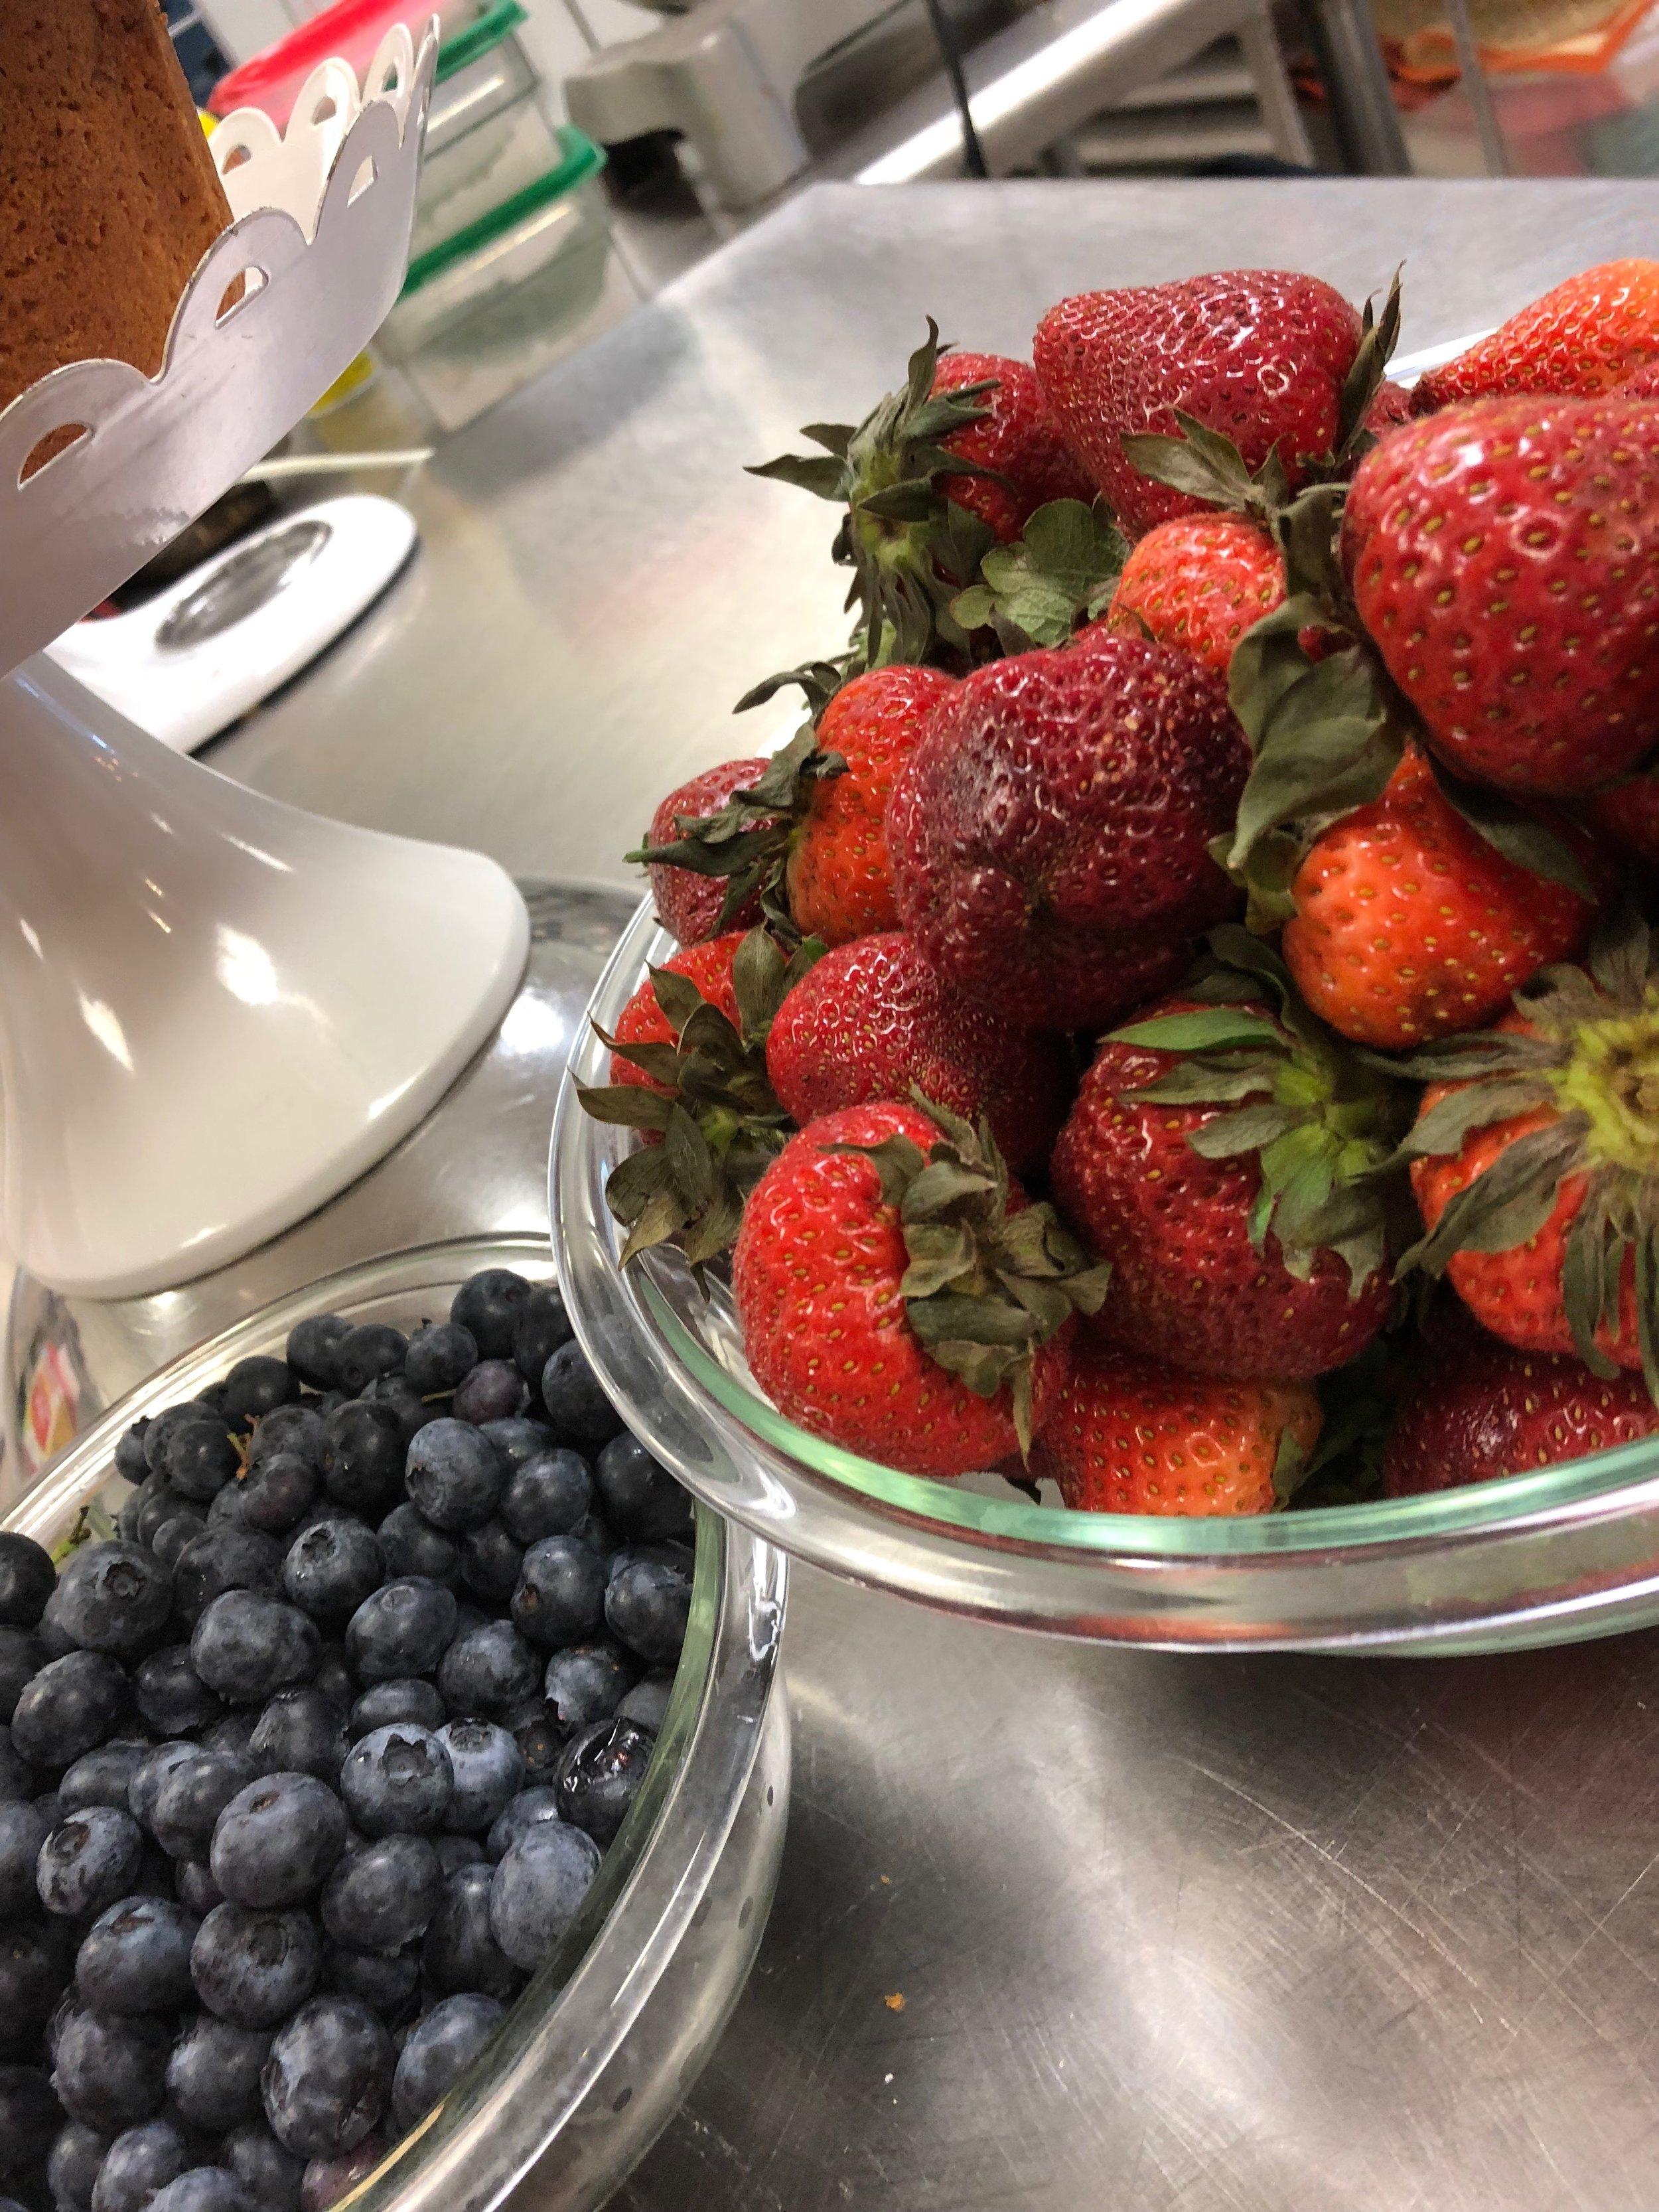 Fresh fruit - Fresh blueberries and strawberries